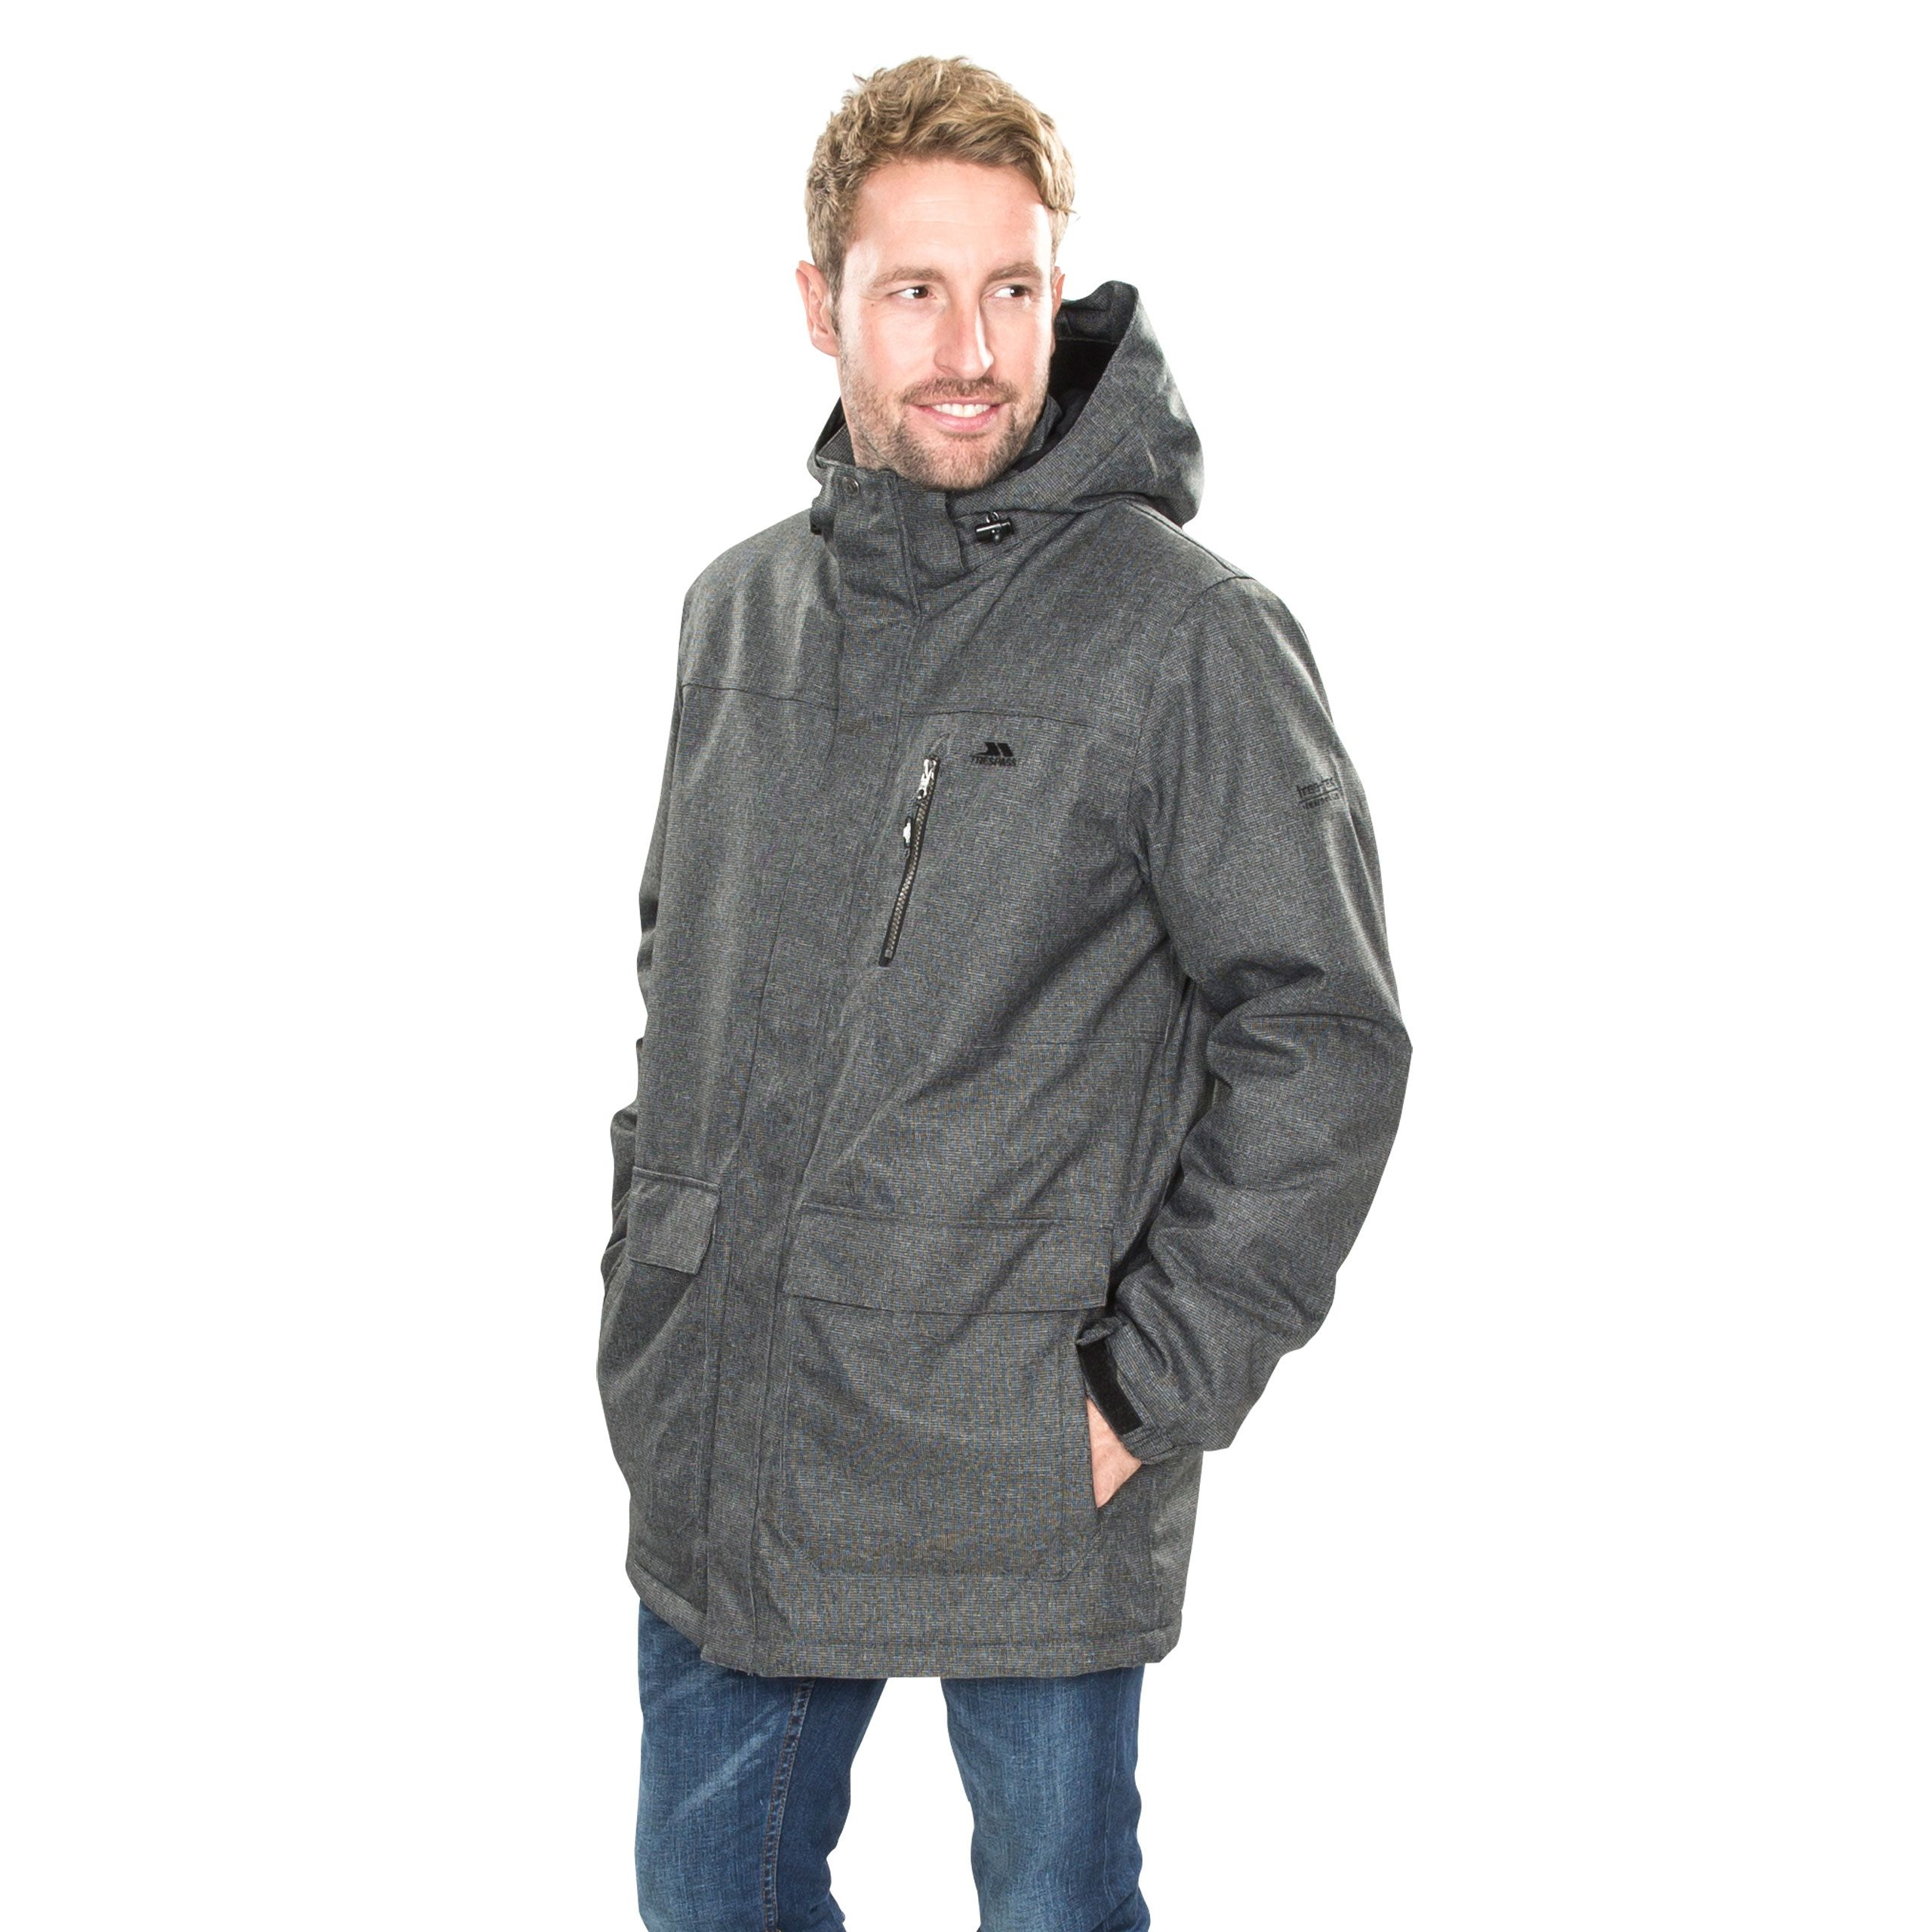 Allen Mens Dlx Recco Waterproof Ski Jacket